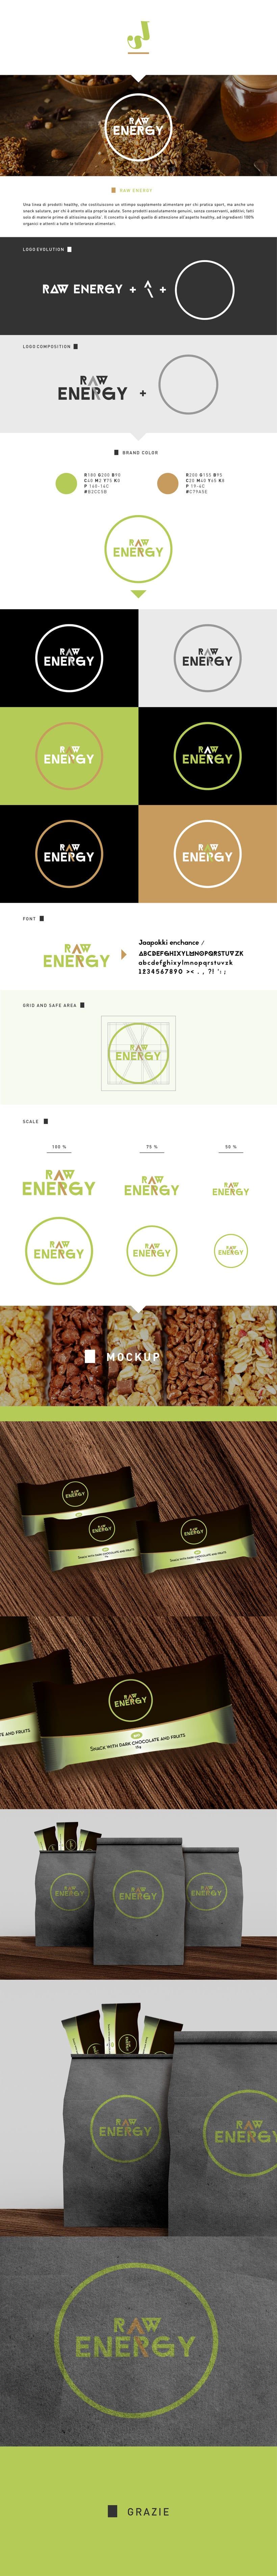 Proposal logo / Raw energy -1